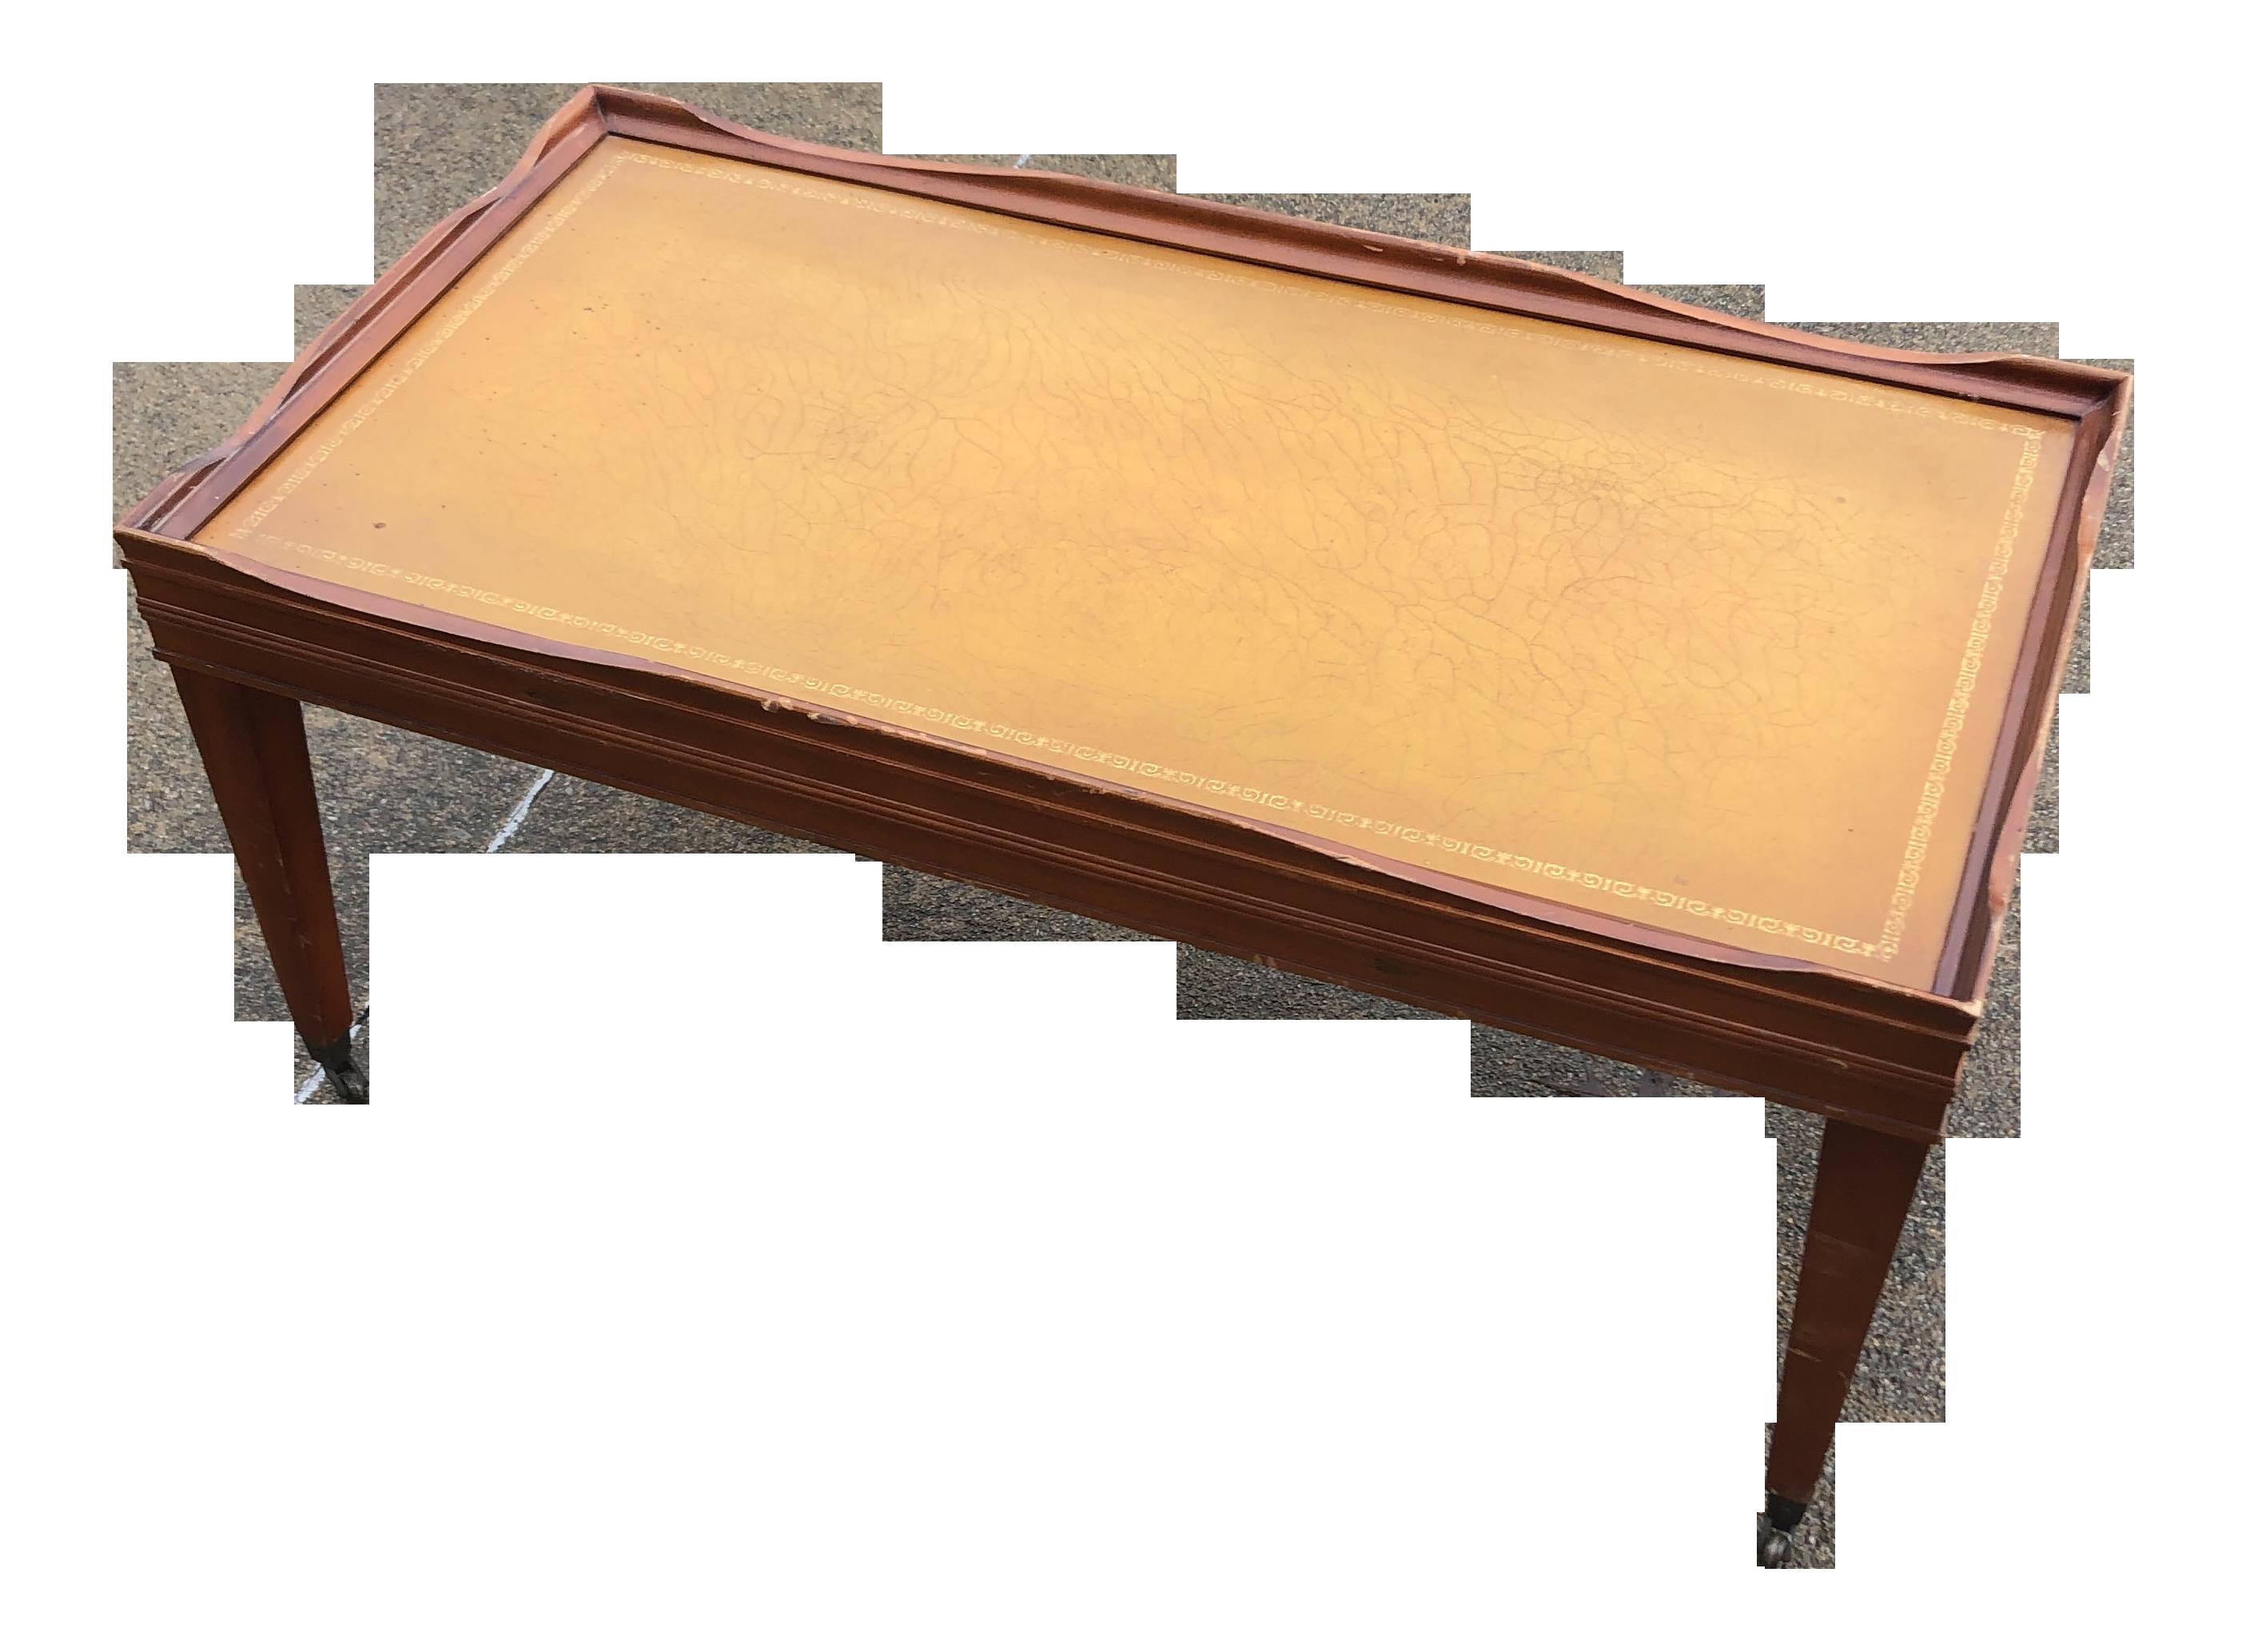 English Small Wooden Coffee Table Chairish